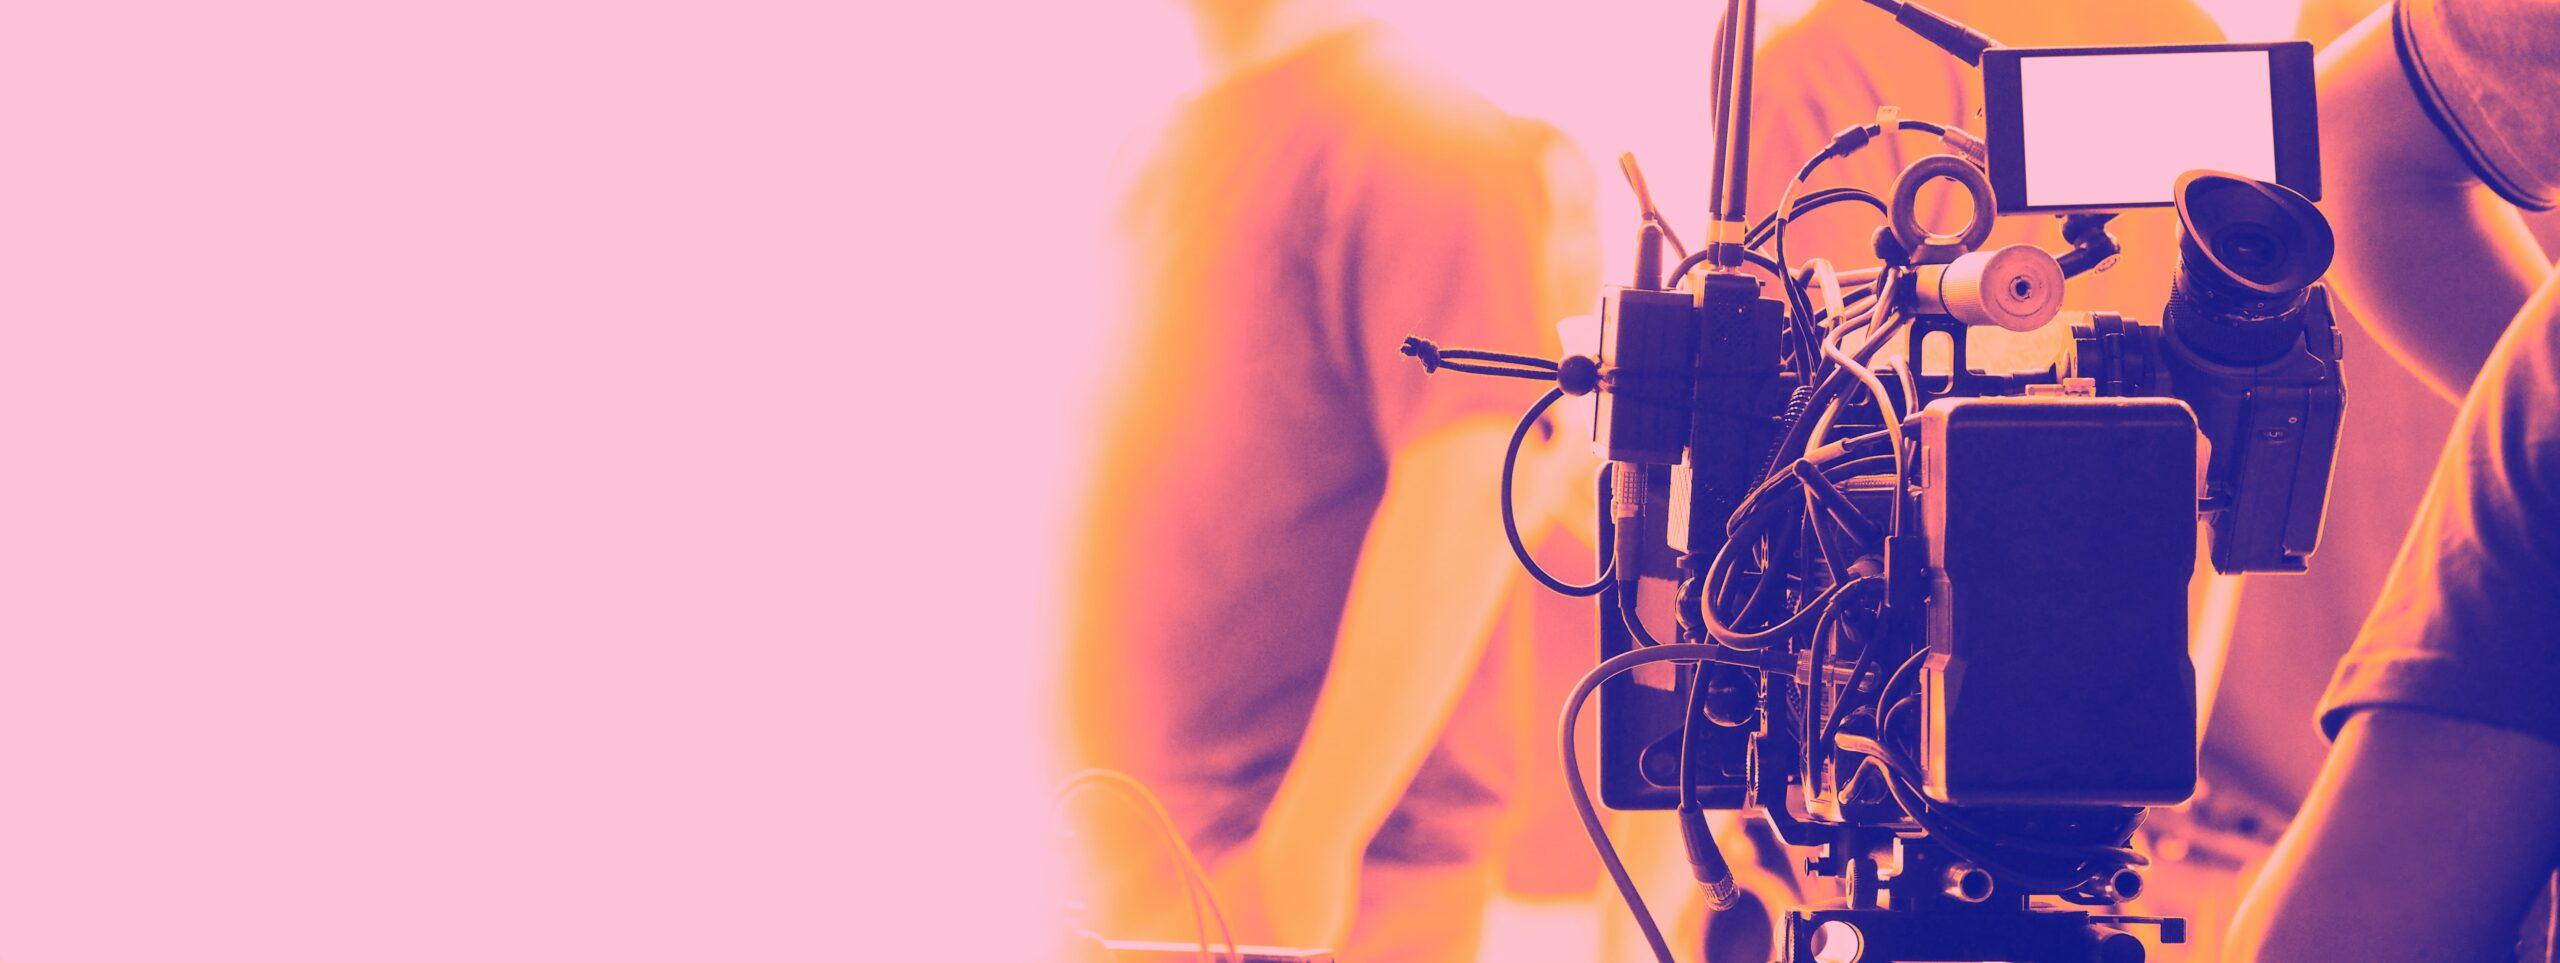 commercial cinematographer filmmaking set crew fil zlj6gcw min